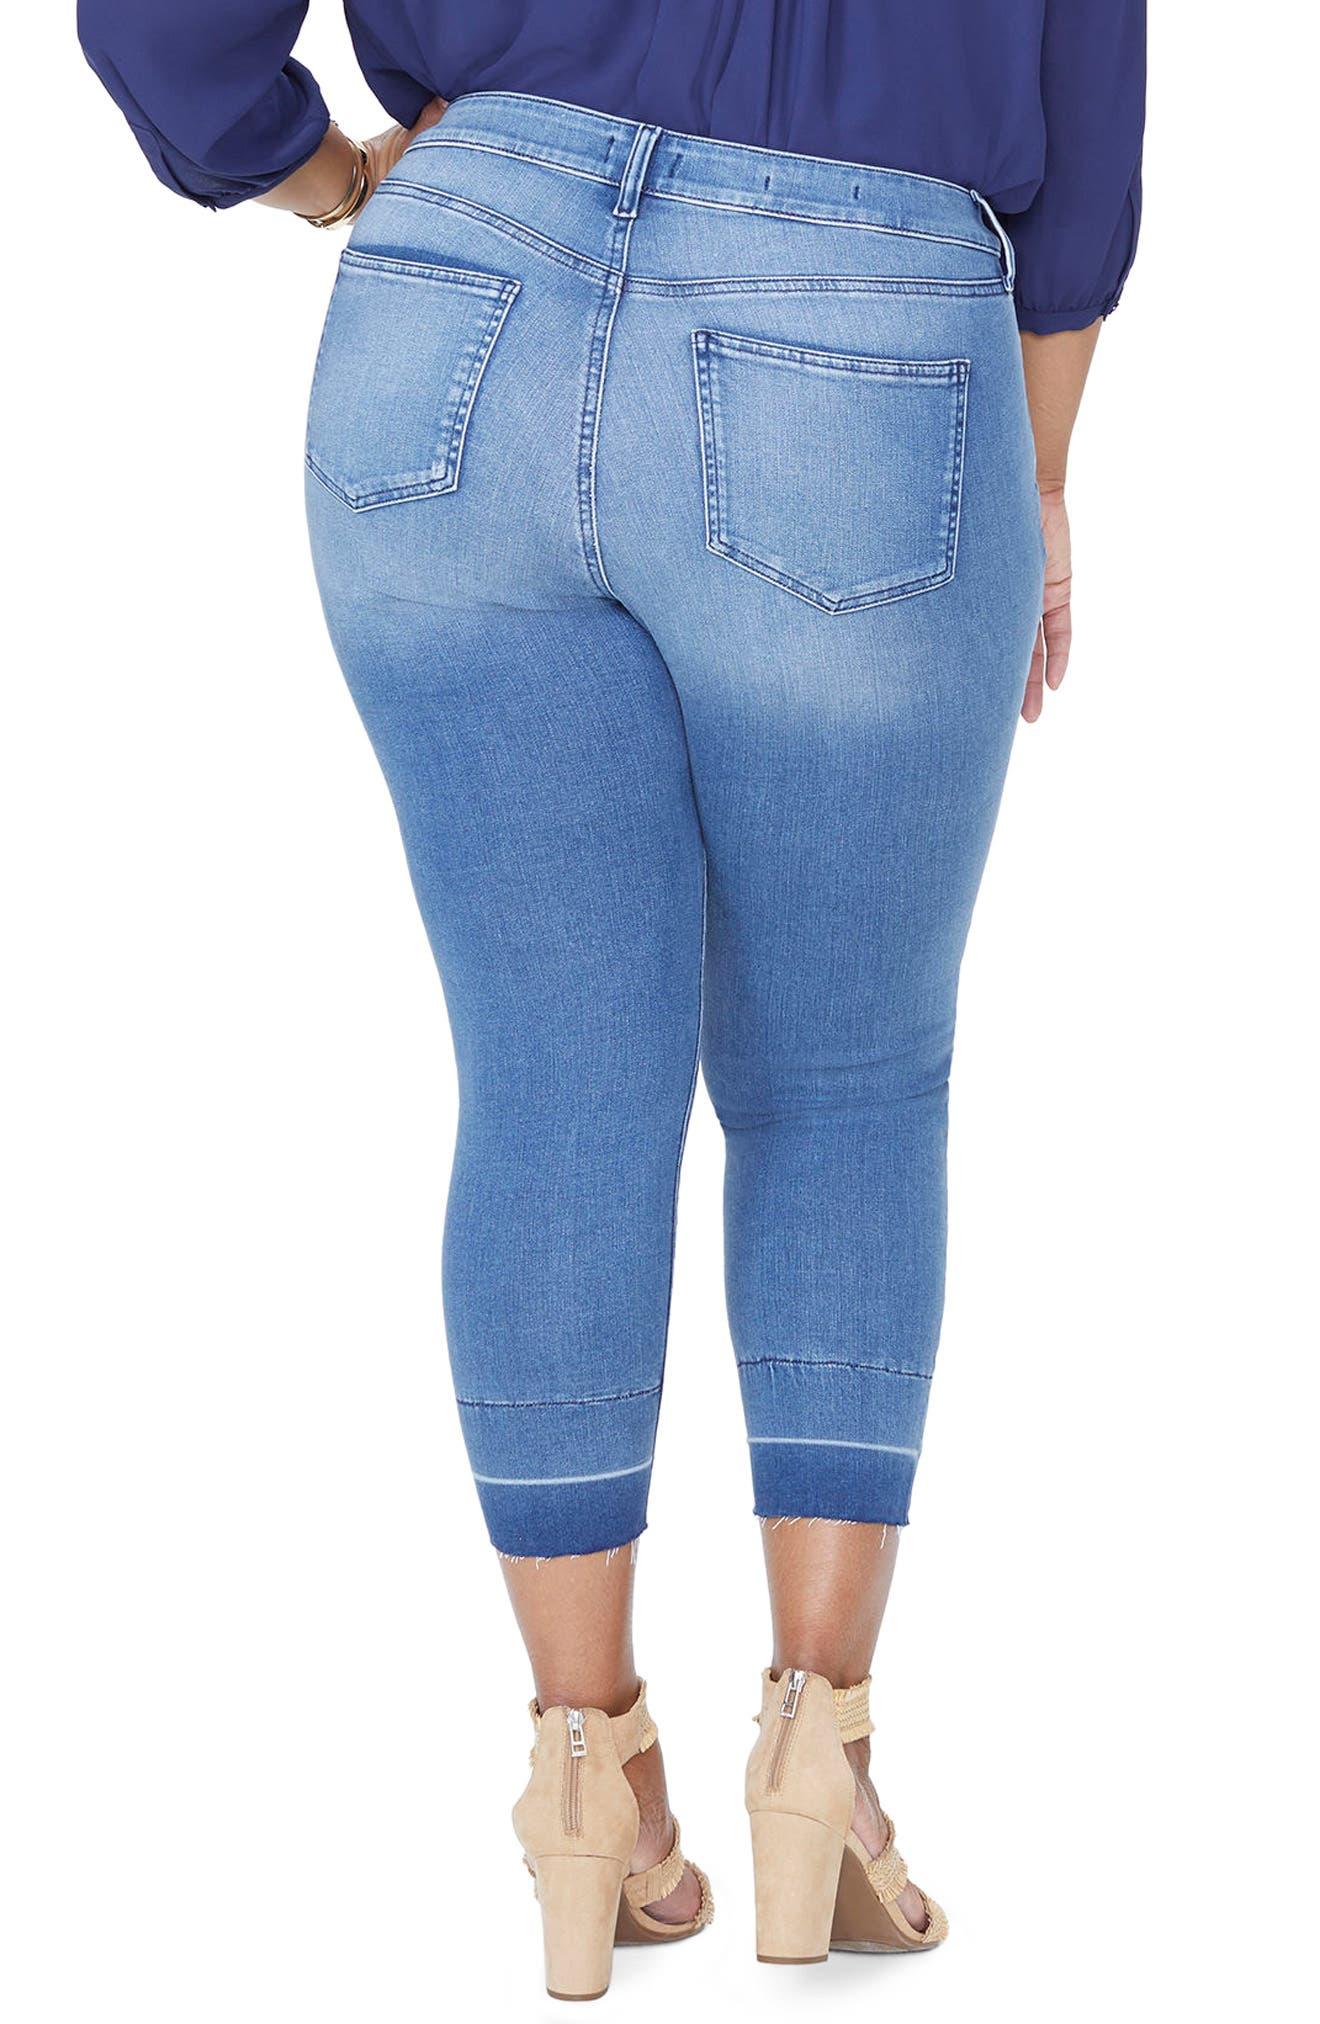 Alina Release Hem Ankle Skinny Jeans,                             Alternate thumbnail 2, color,                             410